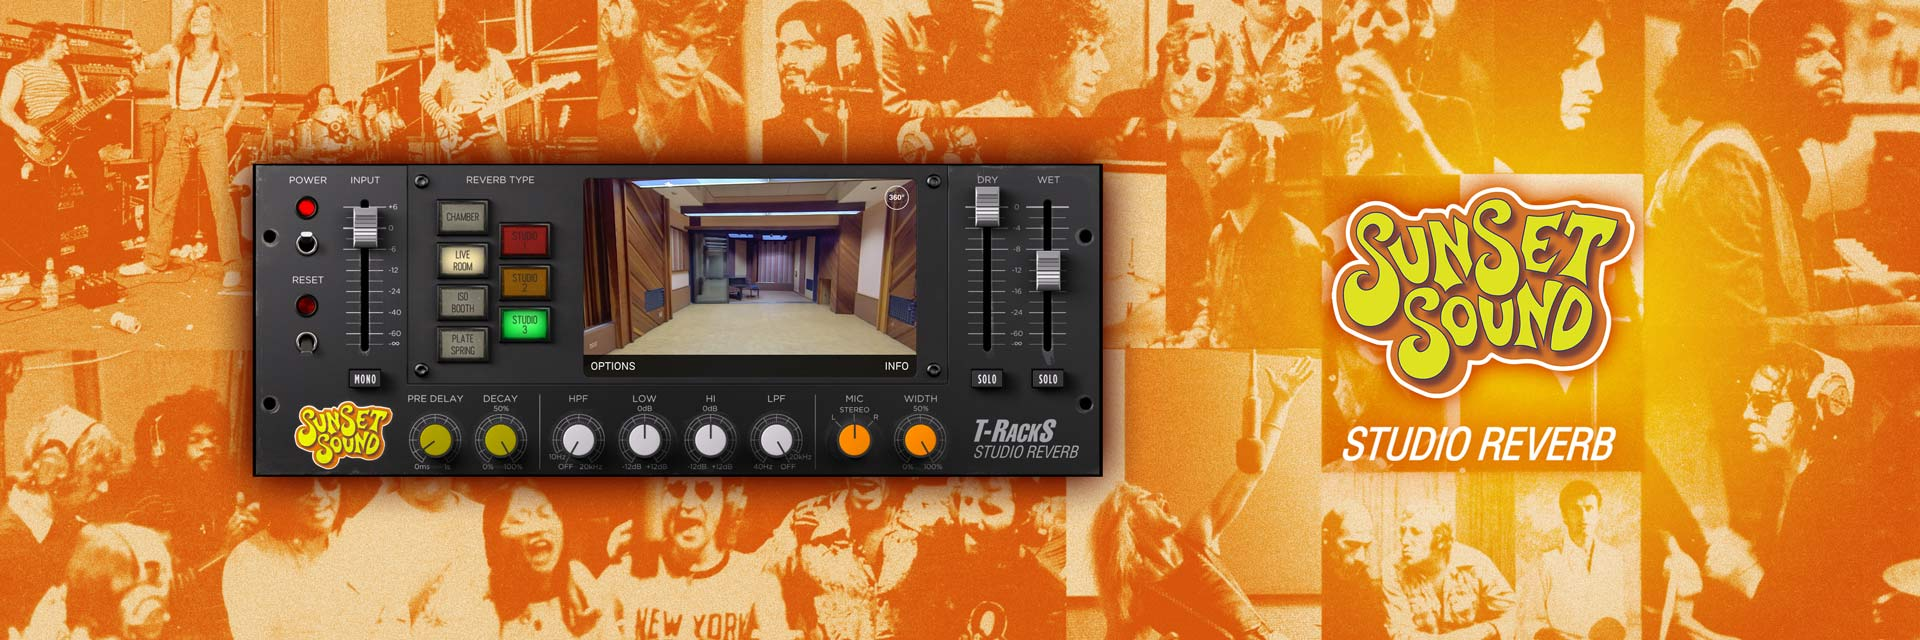 IK Multimedia Sunset Sound Studio Reverb software download